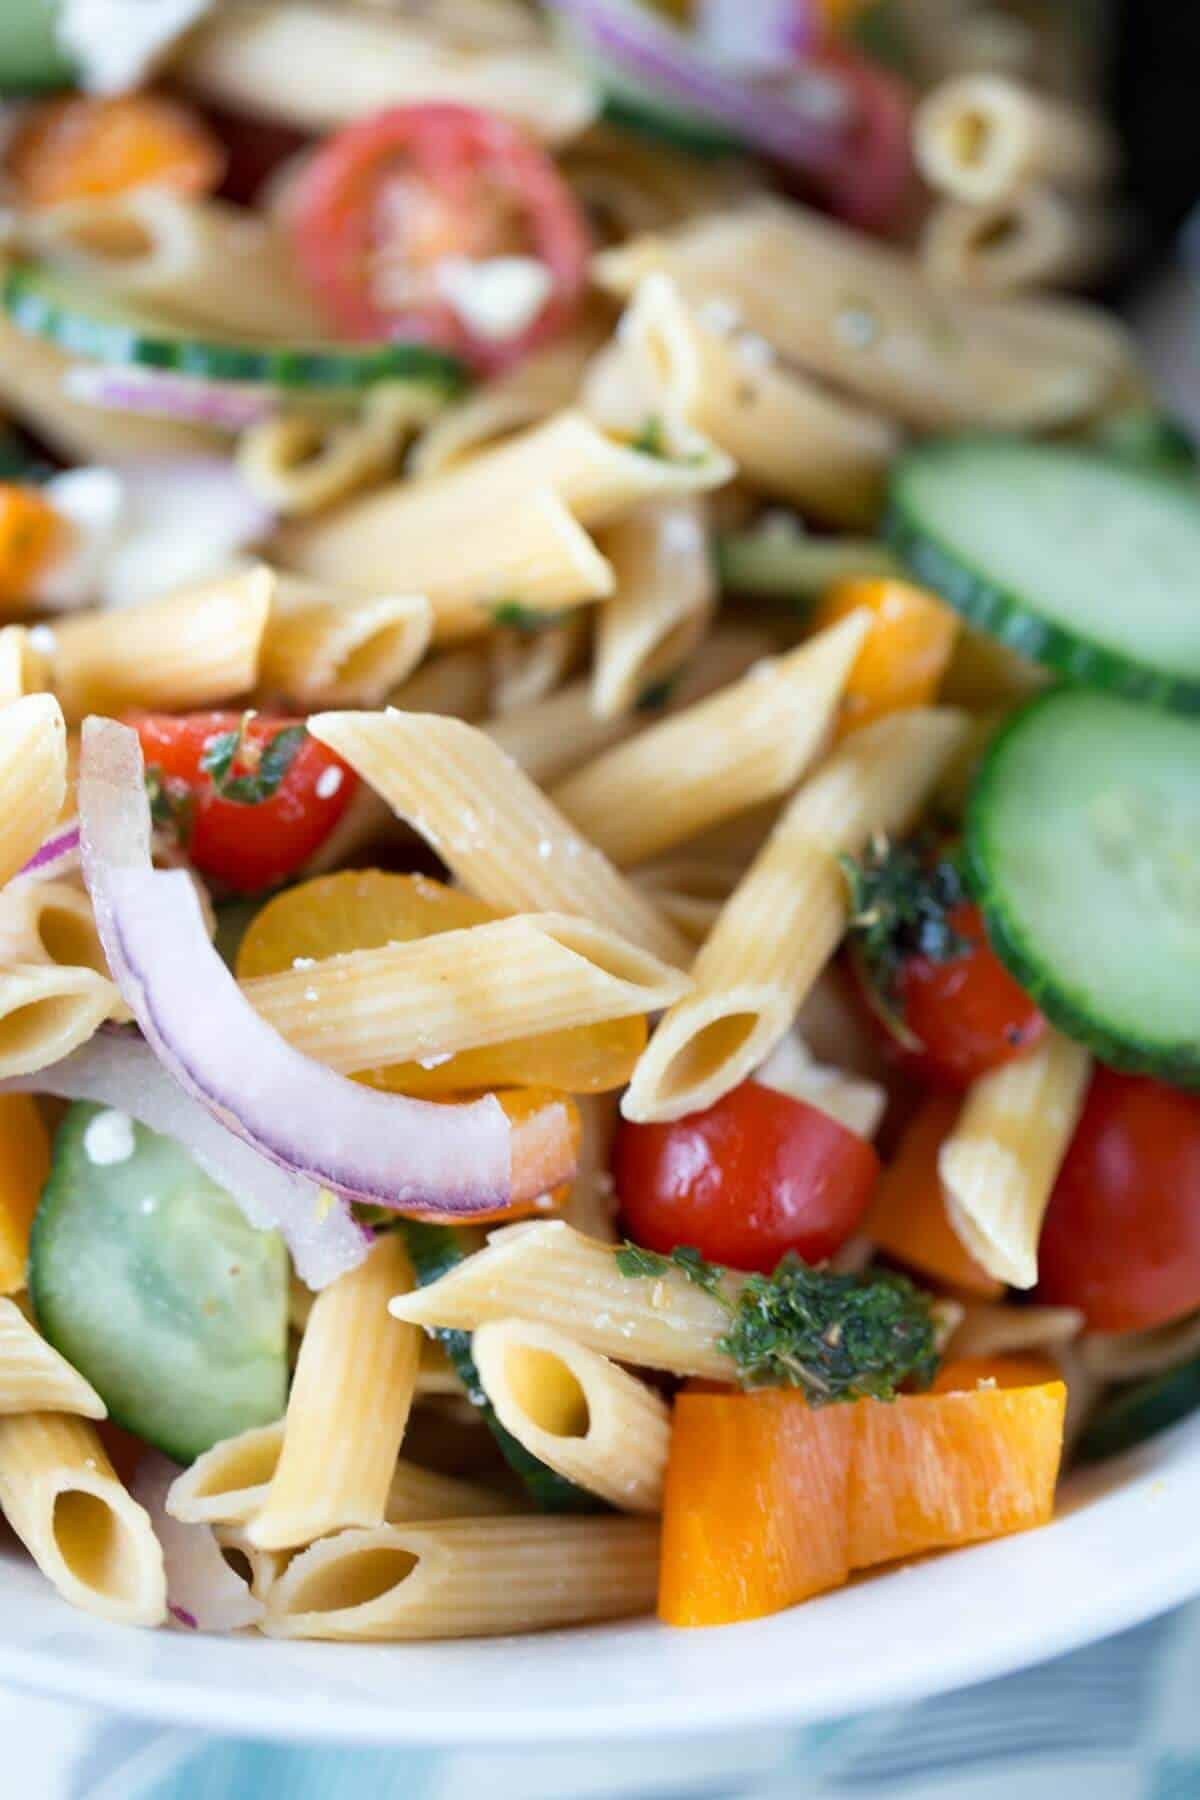 Pasta salad dressing recipes easy